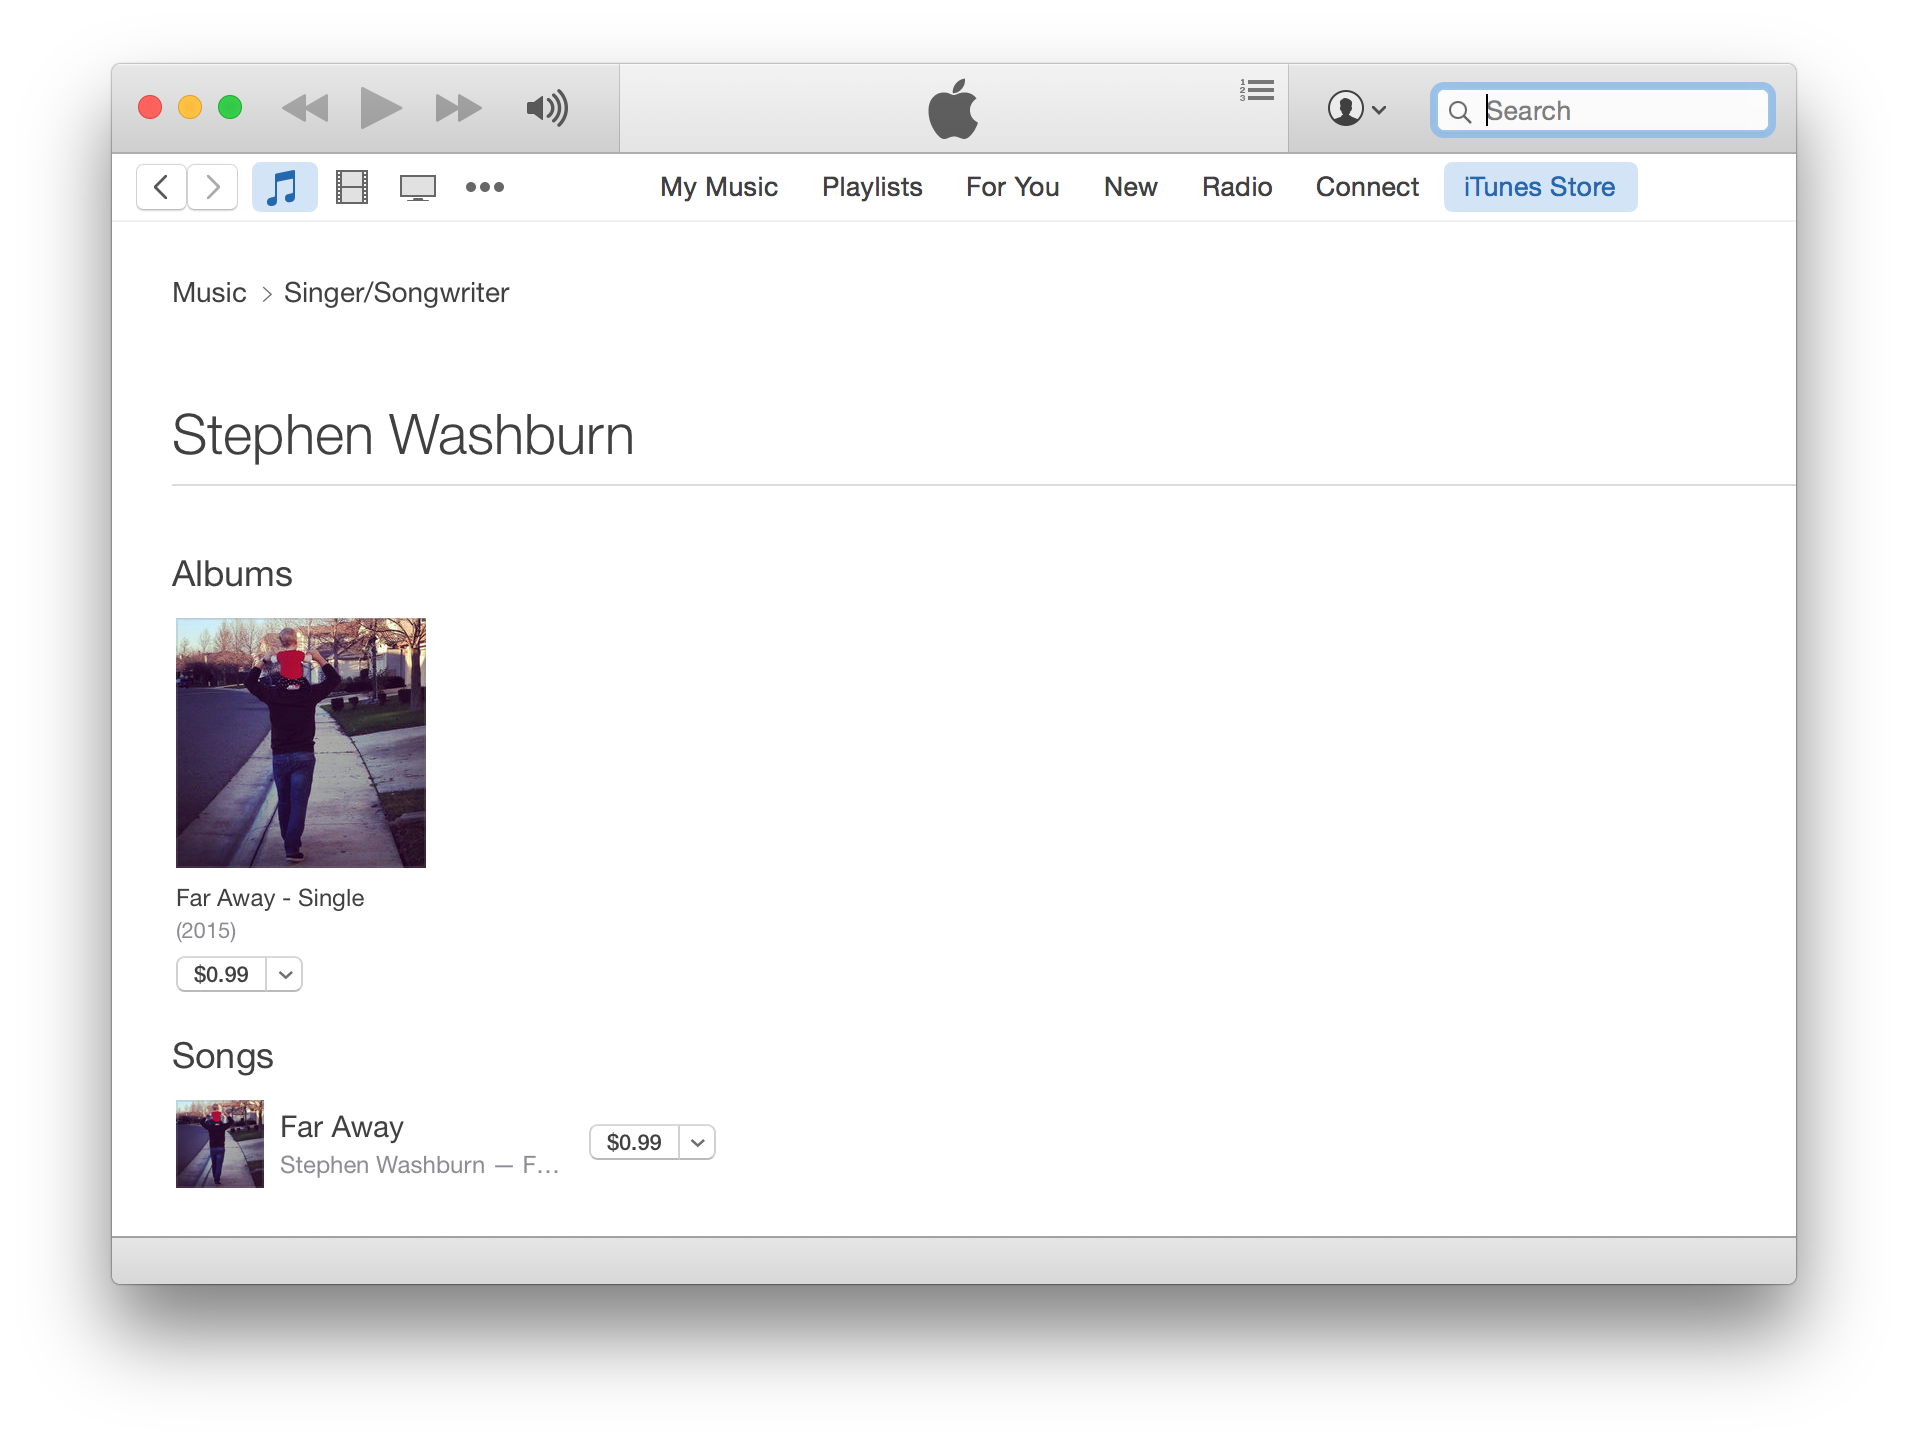 Far Away on iTunes